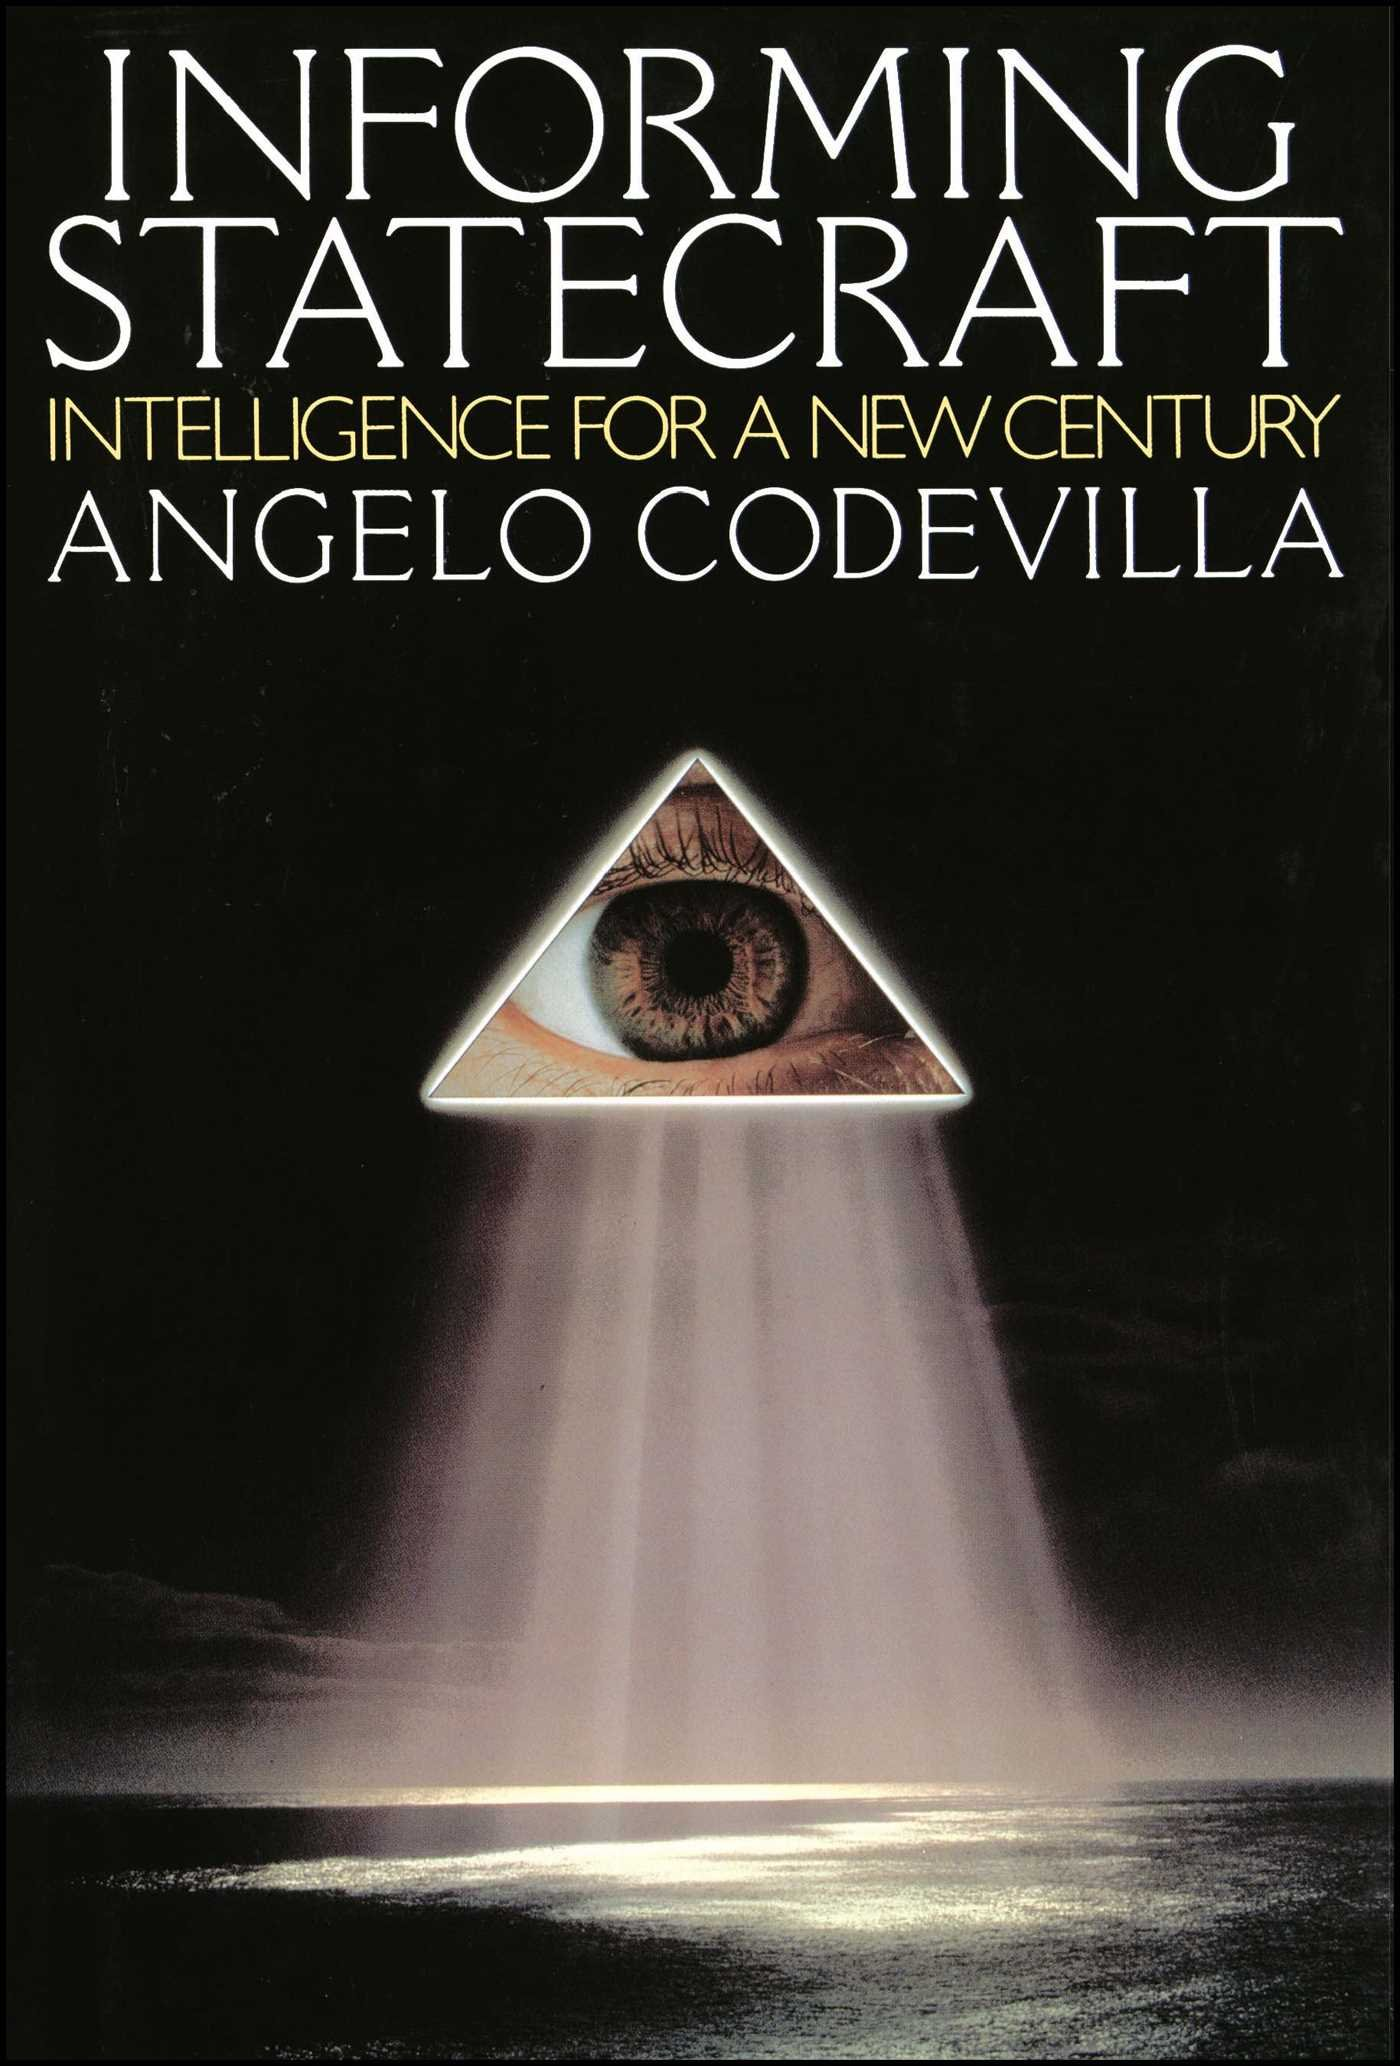 Informing Statecraft: Angelo Codevilla: 9780743244848: Amazon: Books